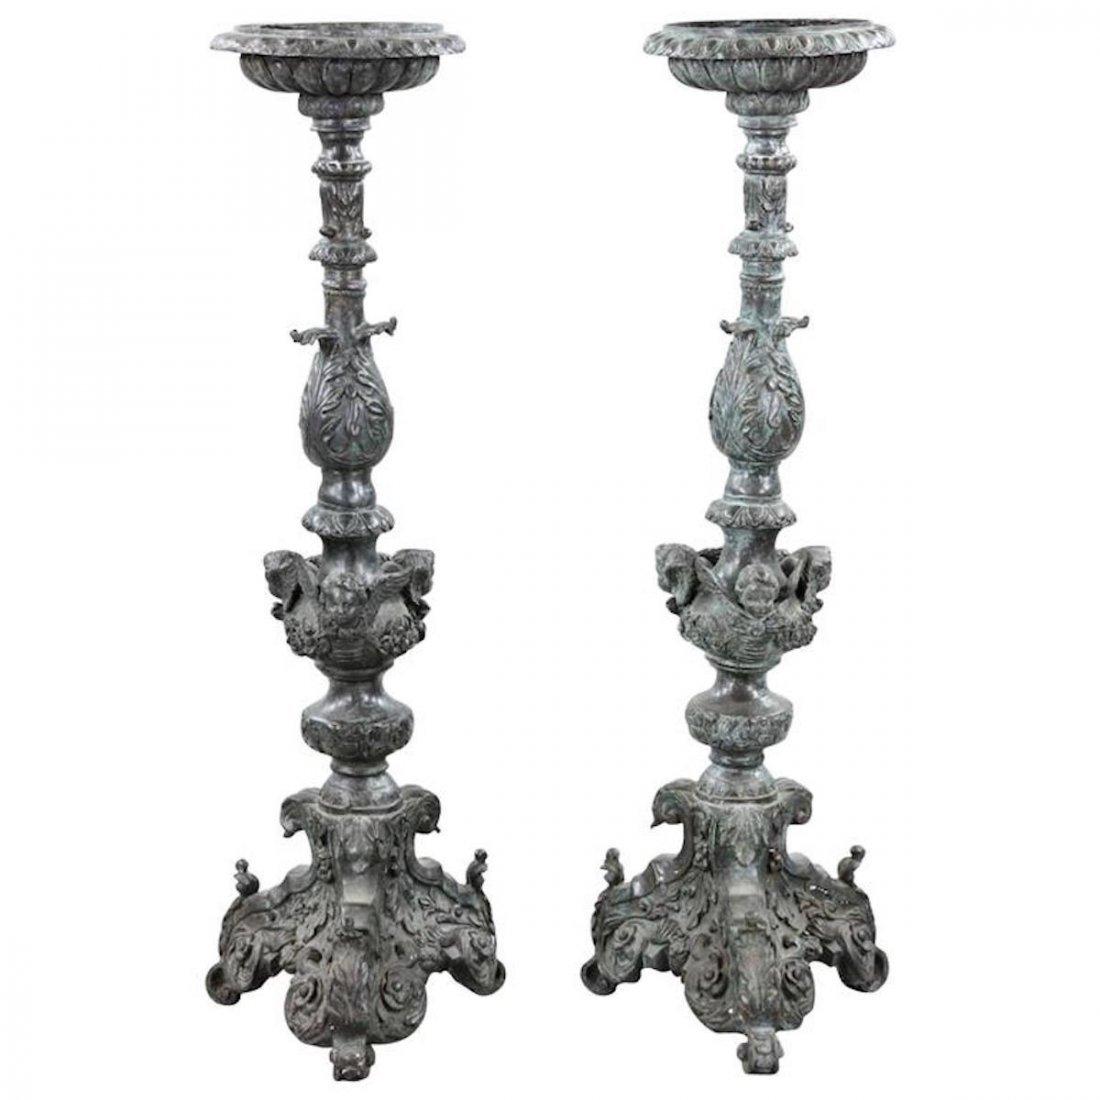 Pair of 19th Century Renaissance Revival Torchieres